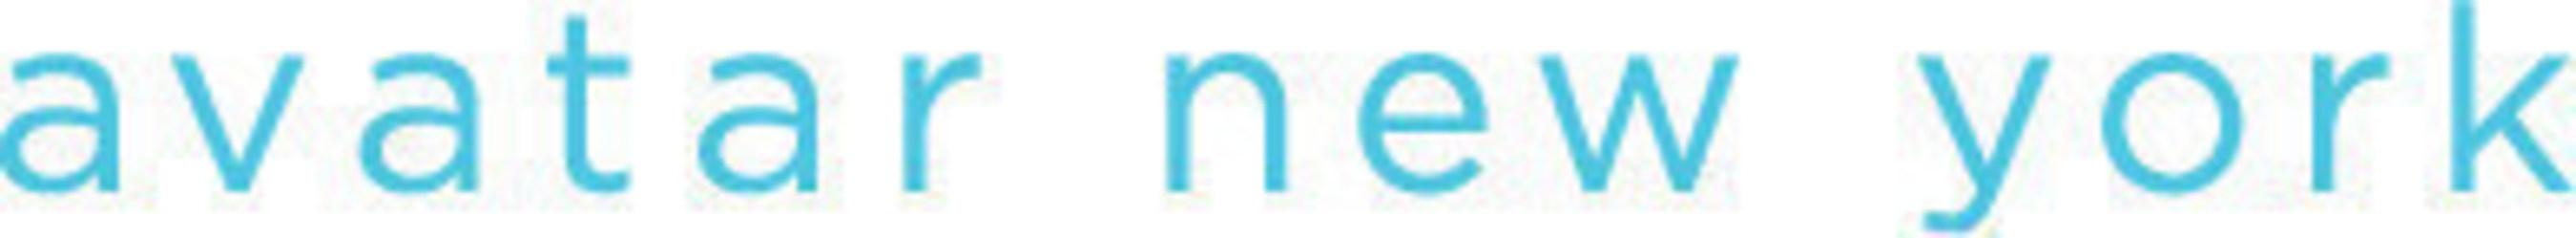 Avatar New York Explains What Eddystone Means for App Development